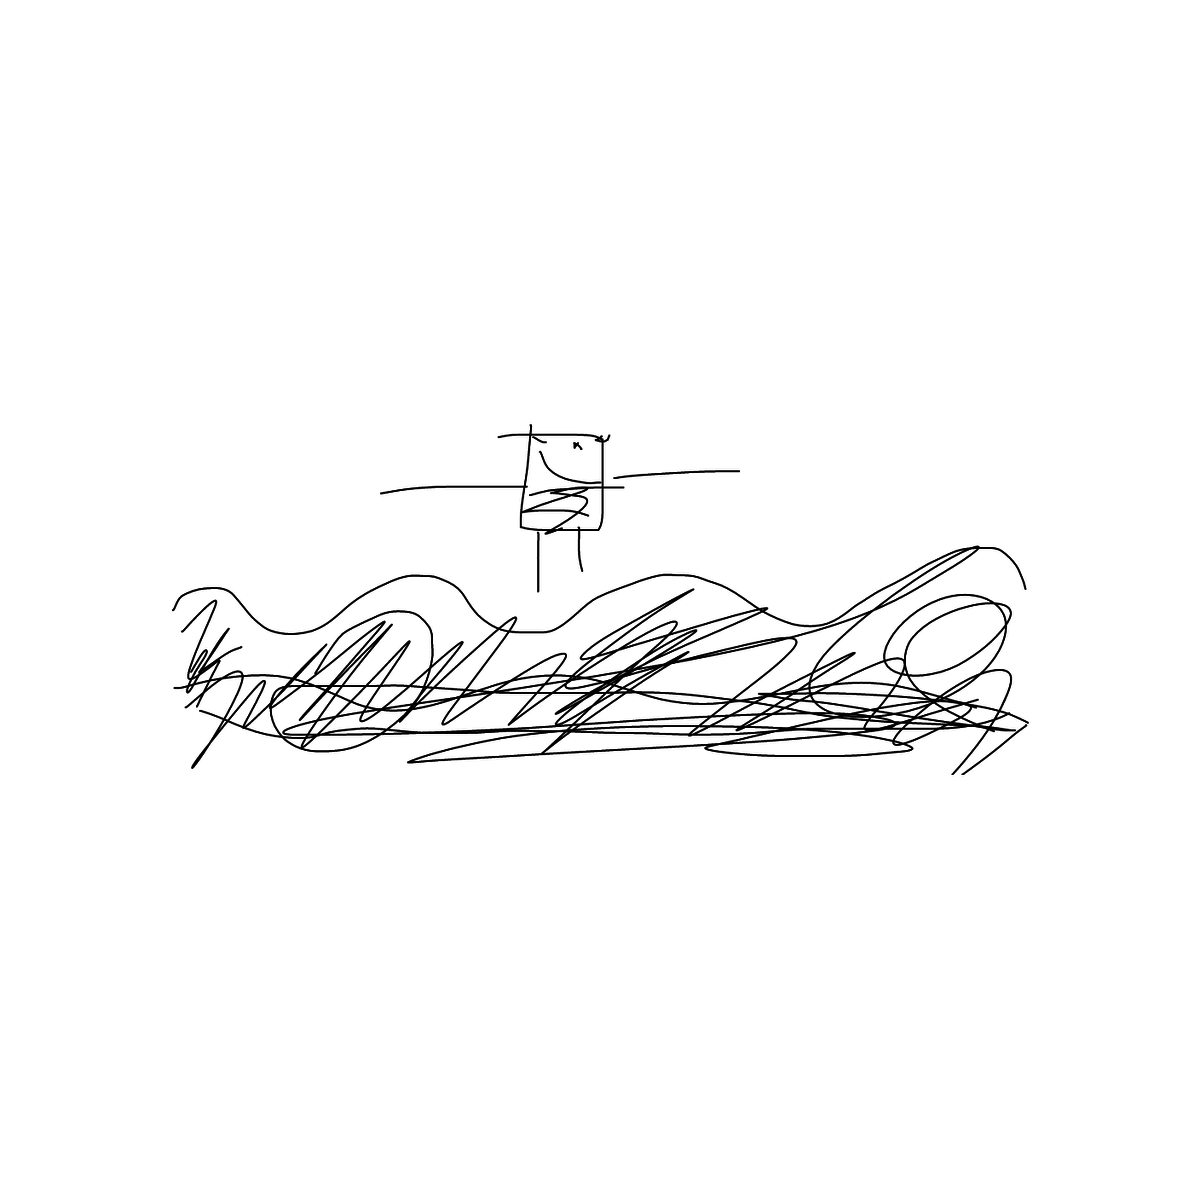 BAAAM drawing#17871 lat:19.5808162689209000lng: -155.4195098876953000